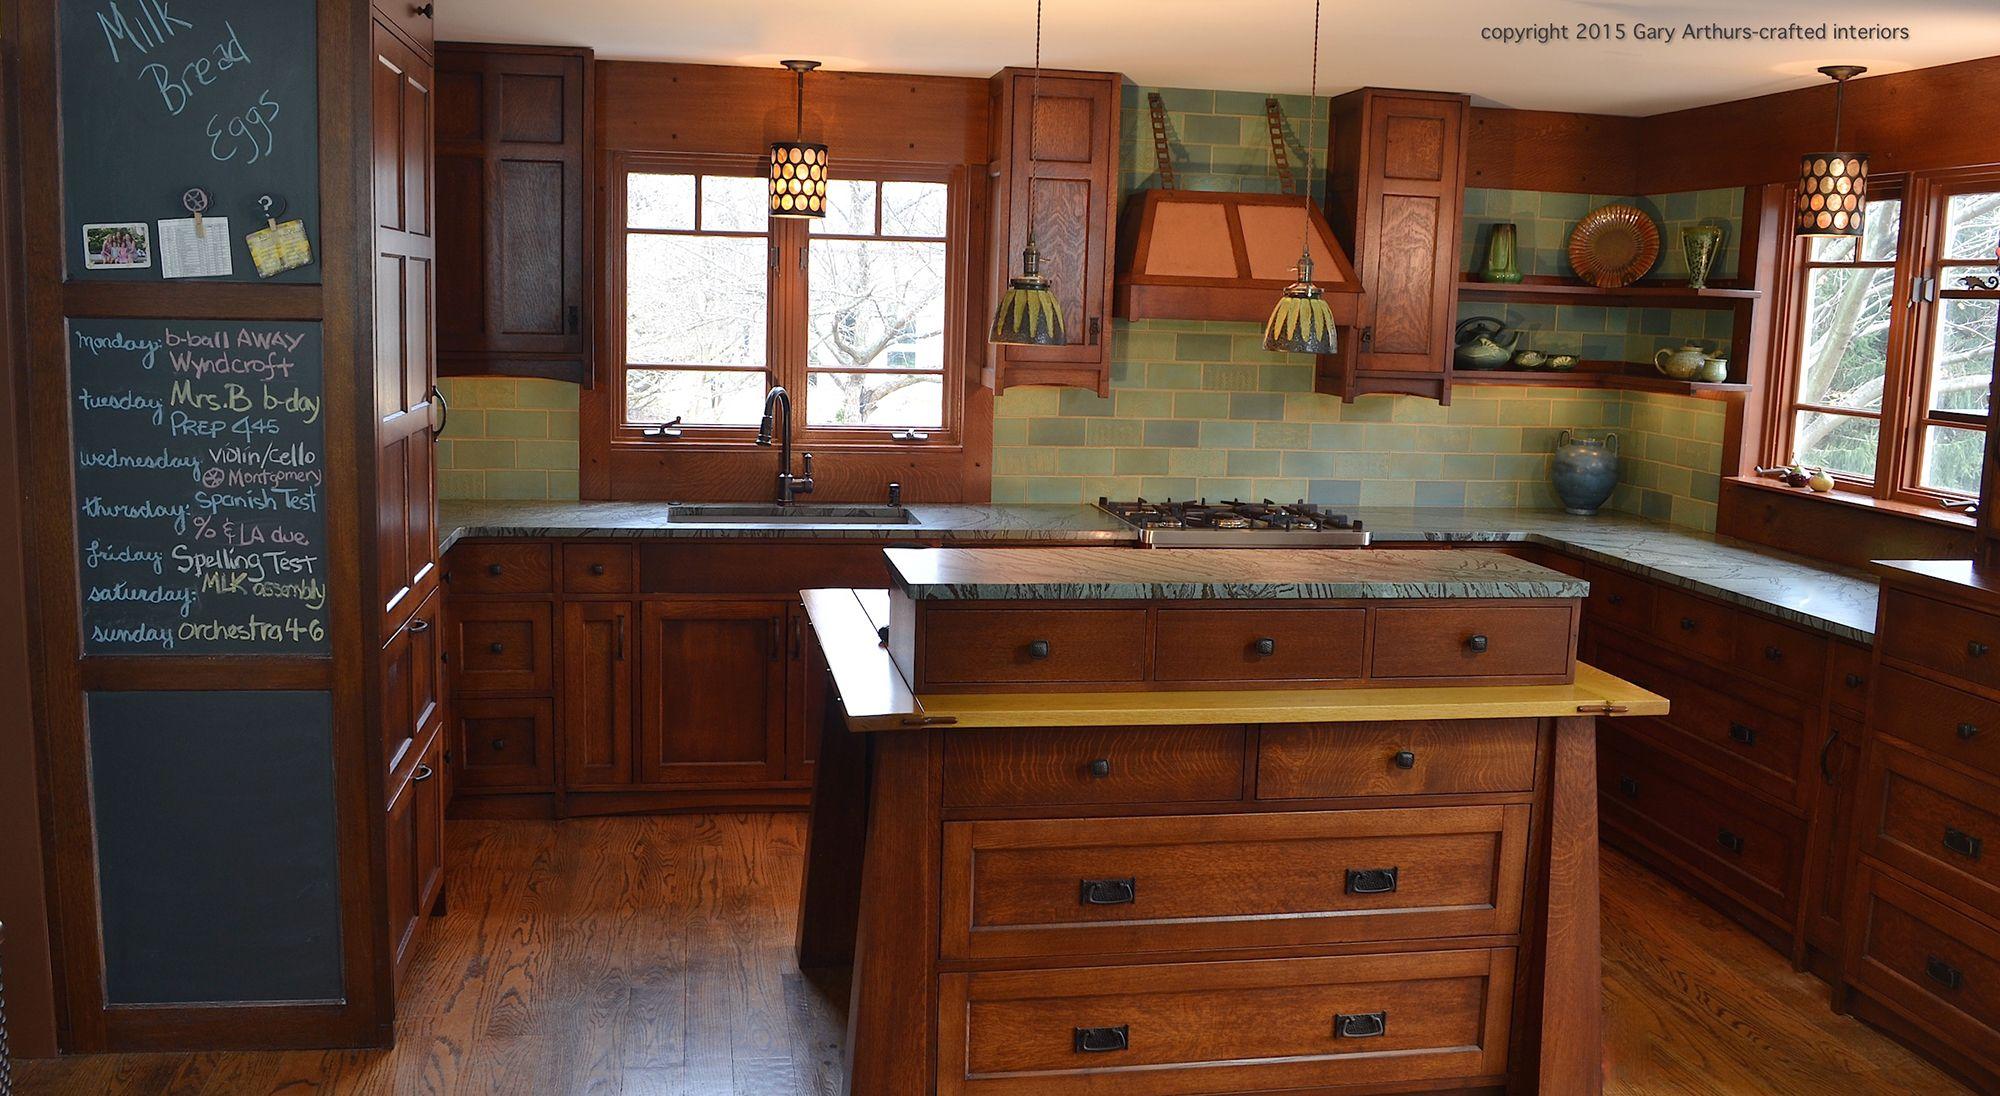 4 X8 Subway Tile 913 Old Copper Texture Spiral Beanstalk Pine Bloom Prairie Mission Style Kitchens Craftsman Kitchen Craftsman Style Kitchen